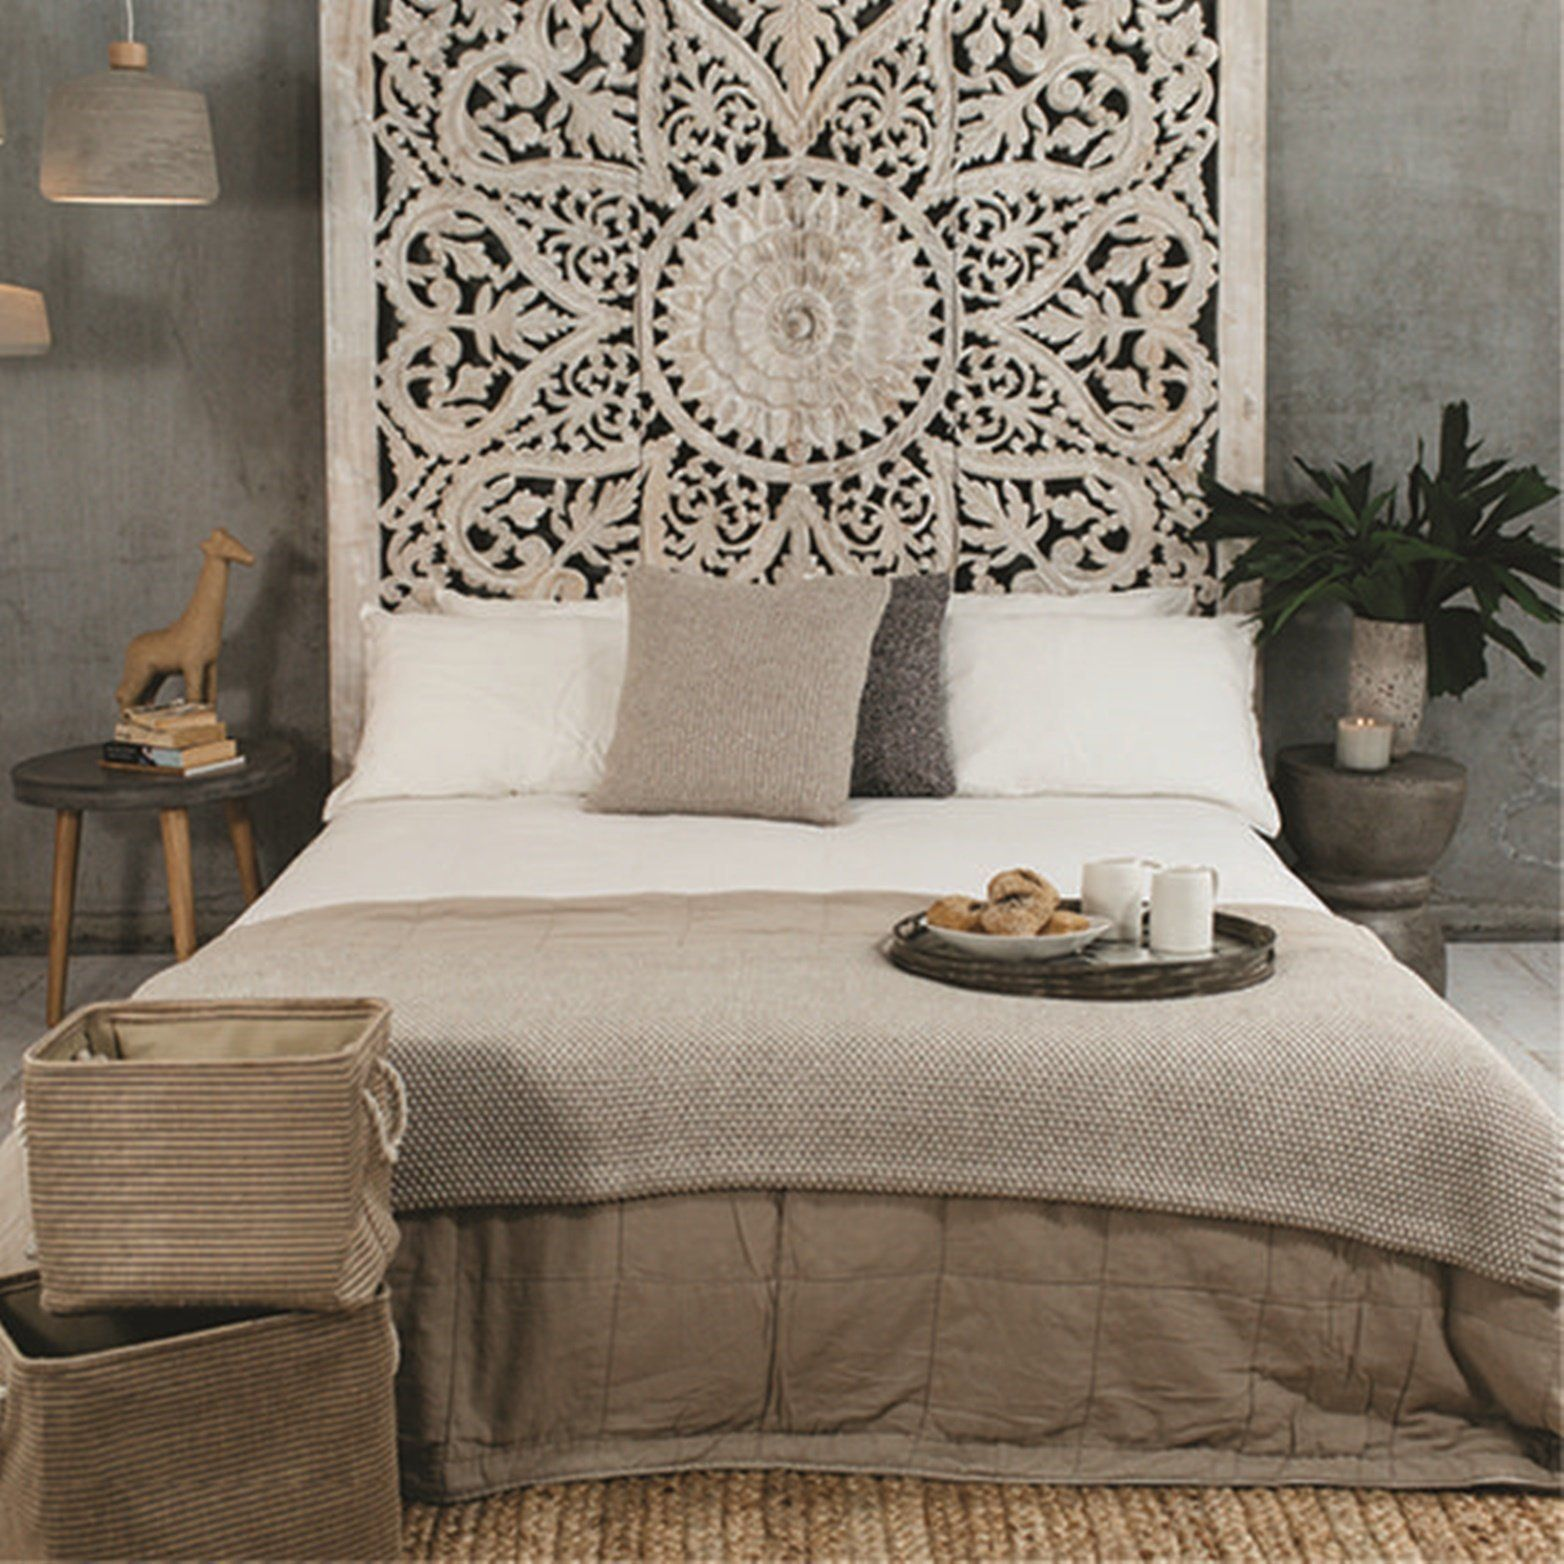 71 Large Wall Art King Size Bed Sculpture Bohemian Headboard Decorative Flower Mandala Wooden Hand Craved Teak Wood Panel White Farm House Living Room White Home Decor White Paneling